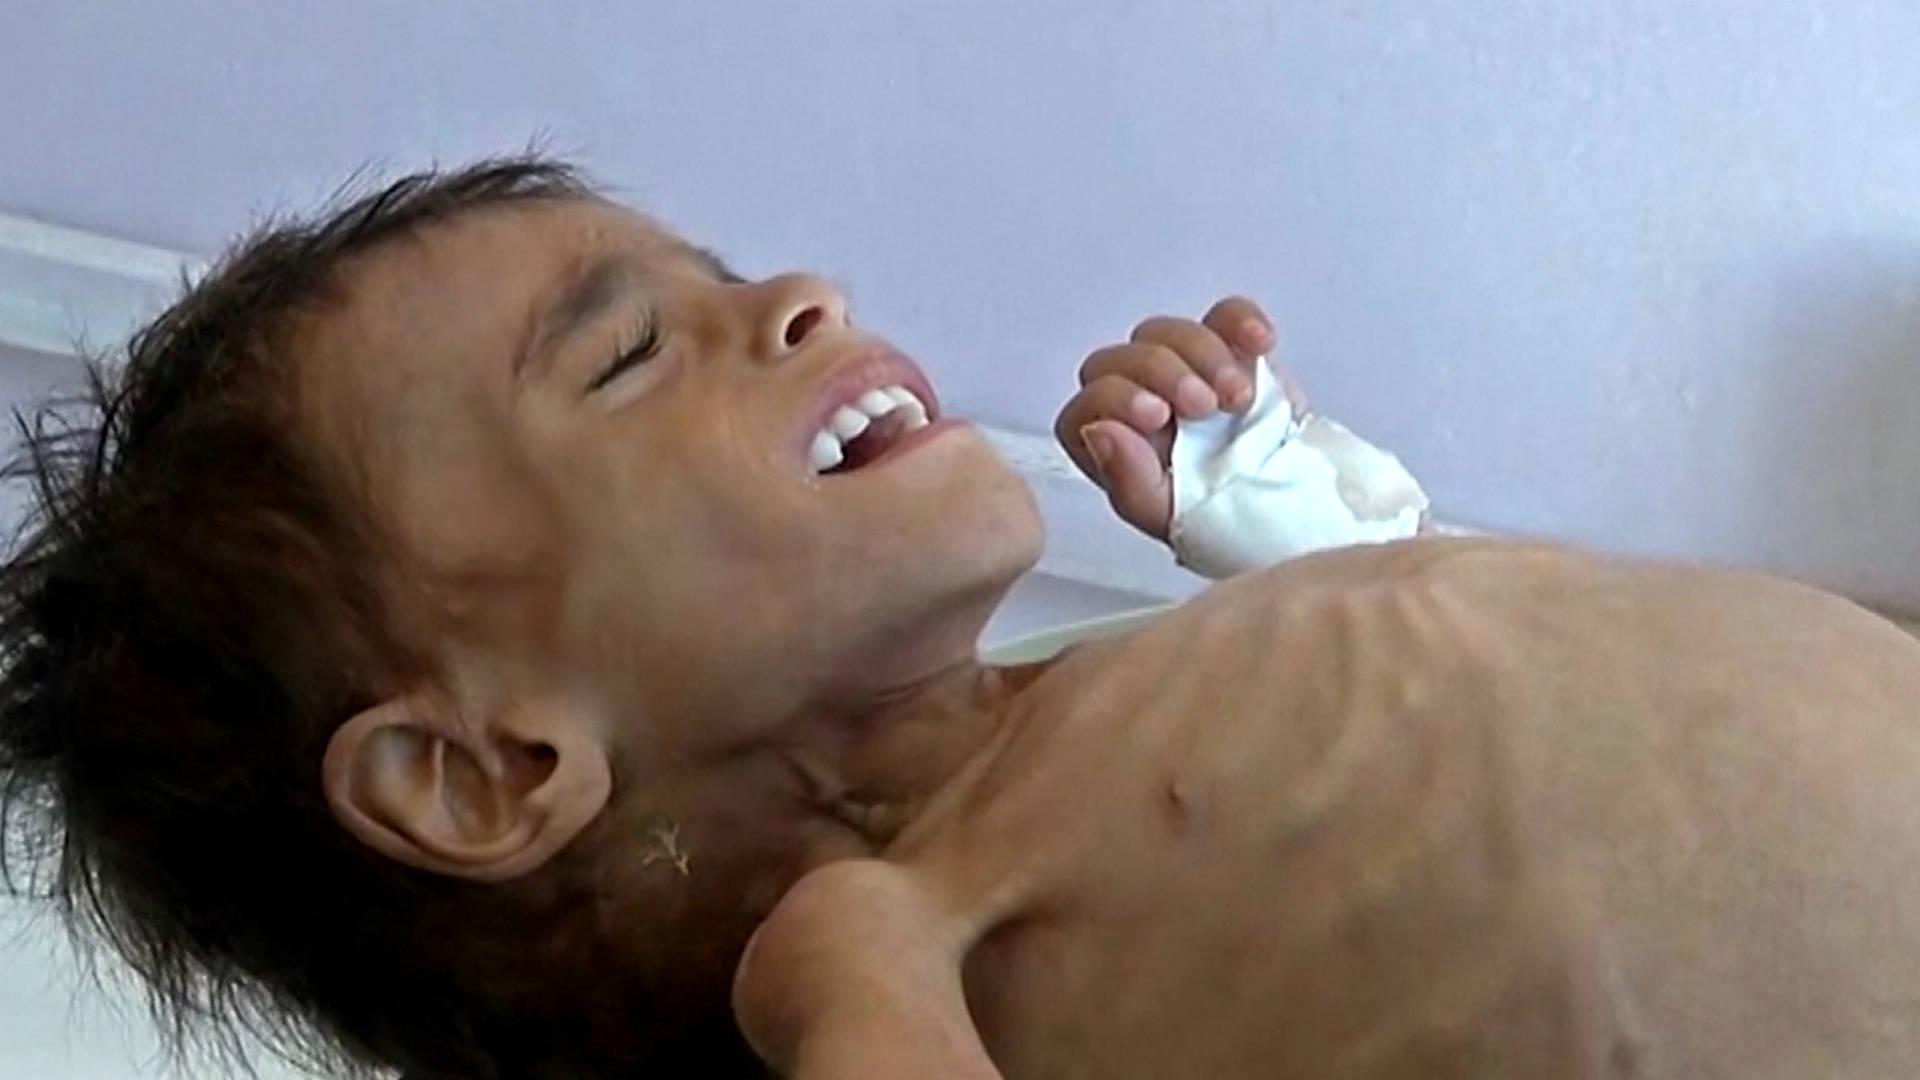 U.N.: A Yemeni Child Dies Every 10 Min. from War-Caused Disease, Hunger